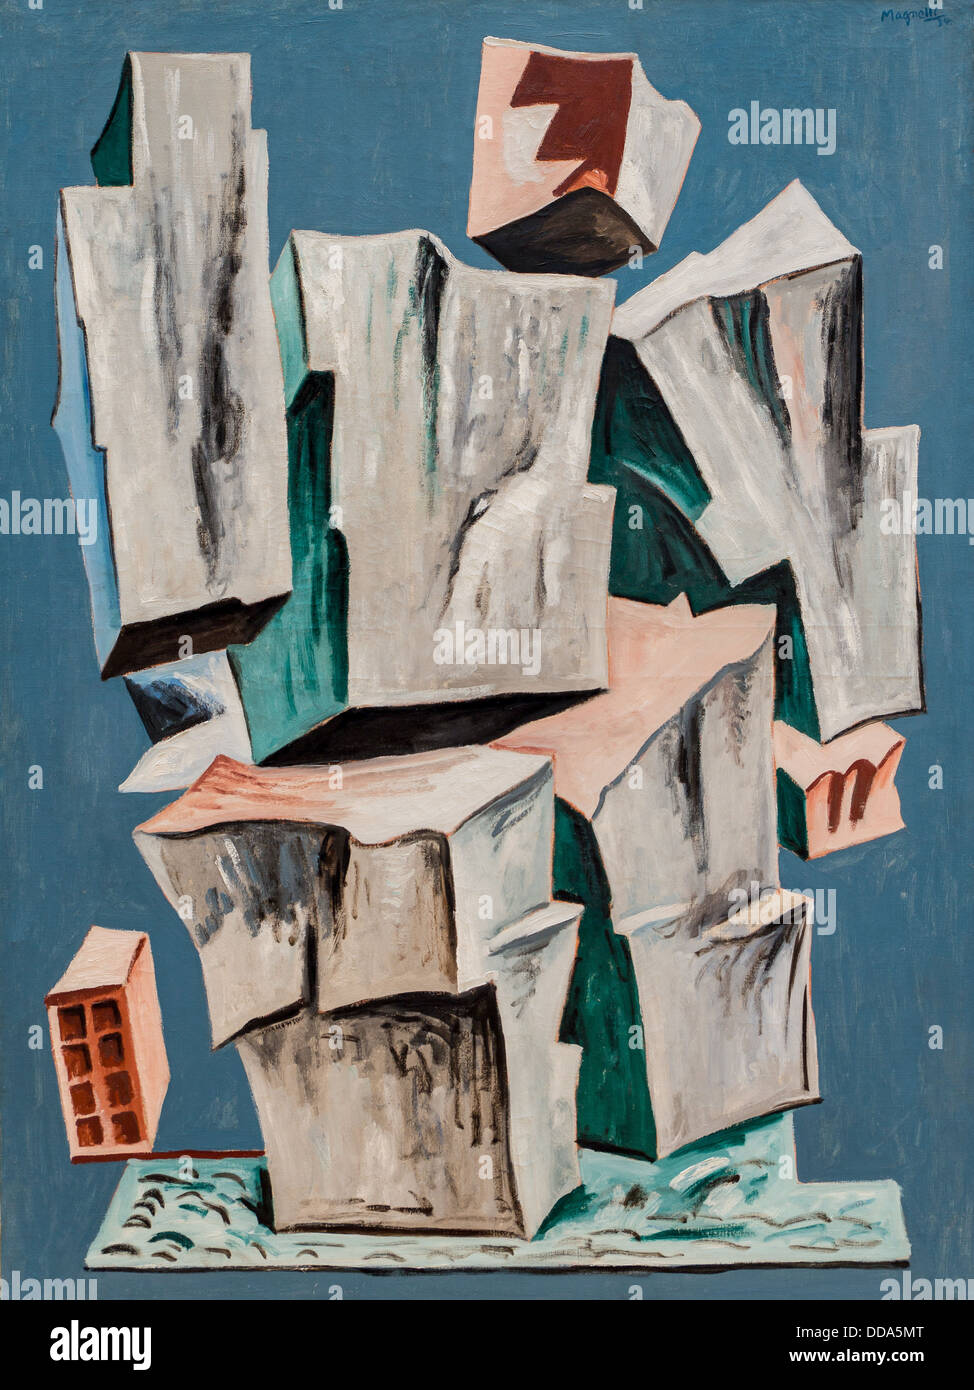 20th century  -  Rock, 1934 - Alberto Magnelli Philippe Sauvan-Magnet / Active Museum Oil on canvas - Stock Image